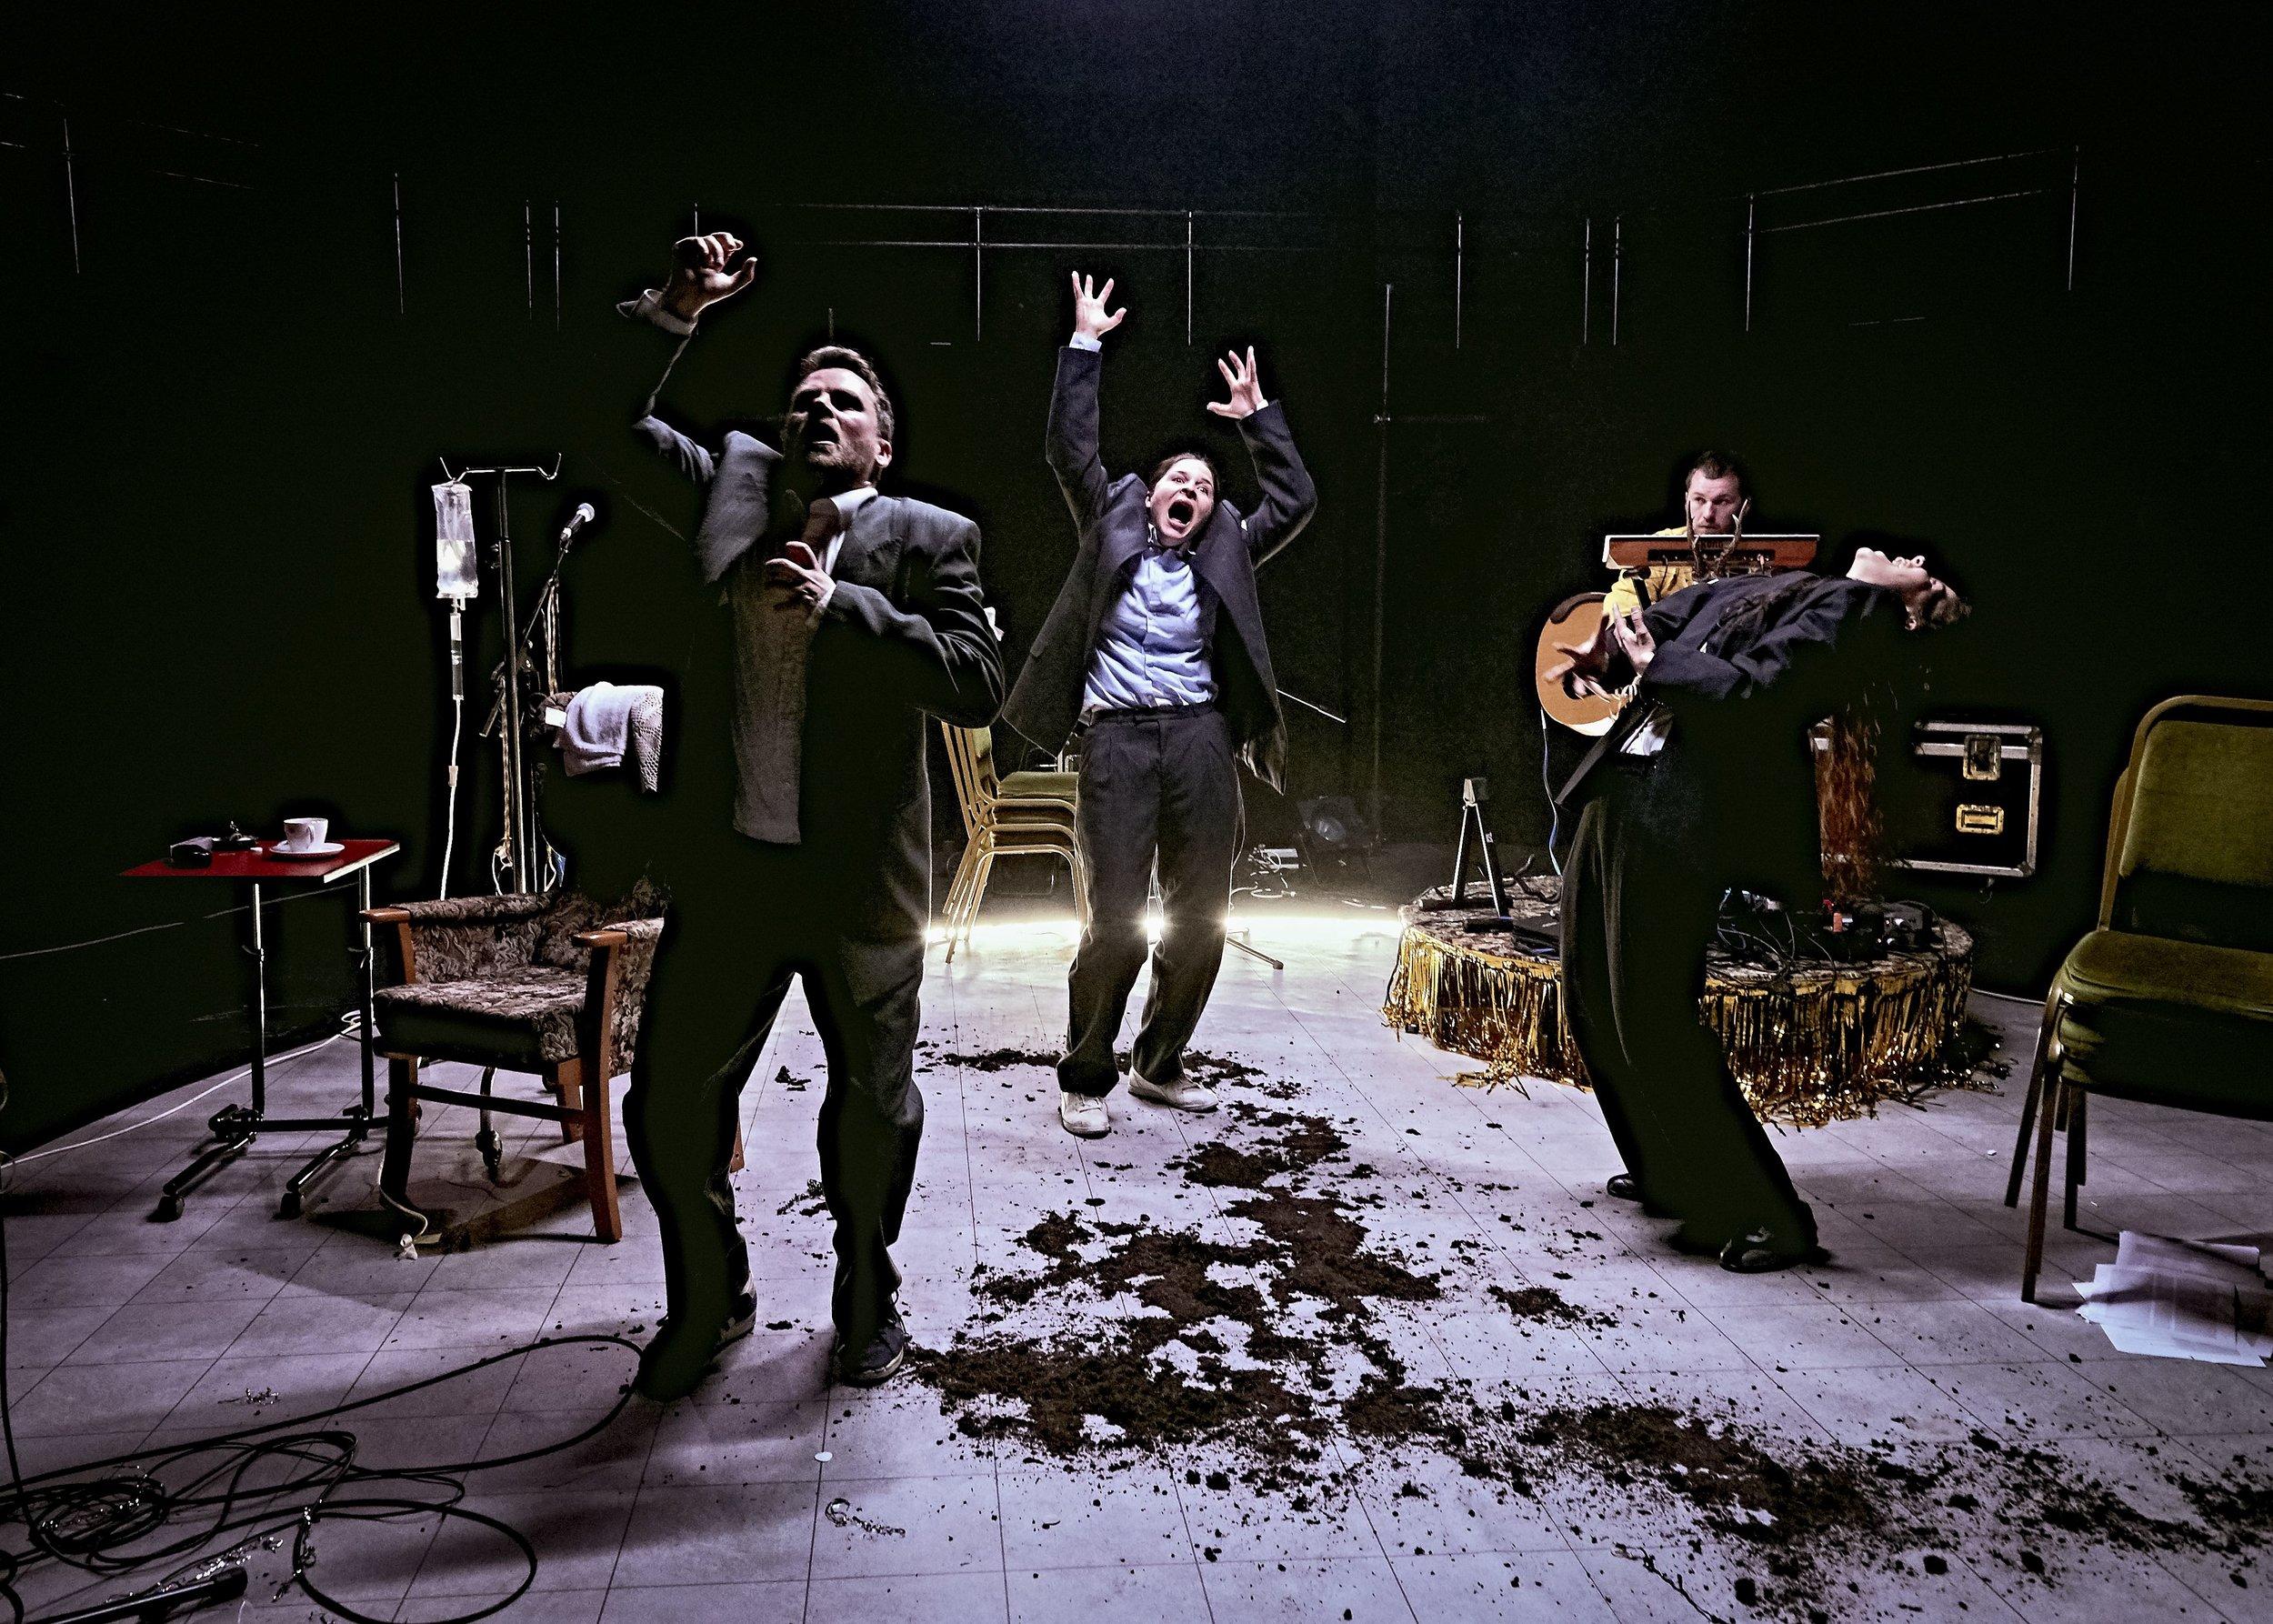 SAETHU CWNINGOD / SHOOTING RABBITS - by PowderHouse